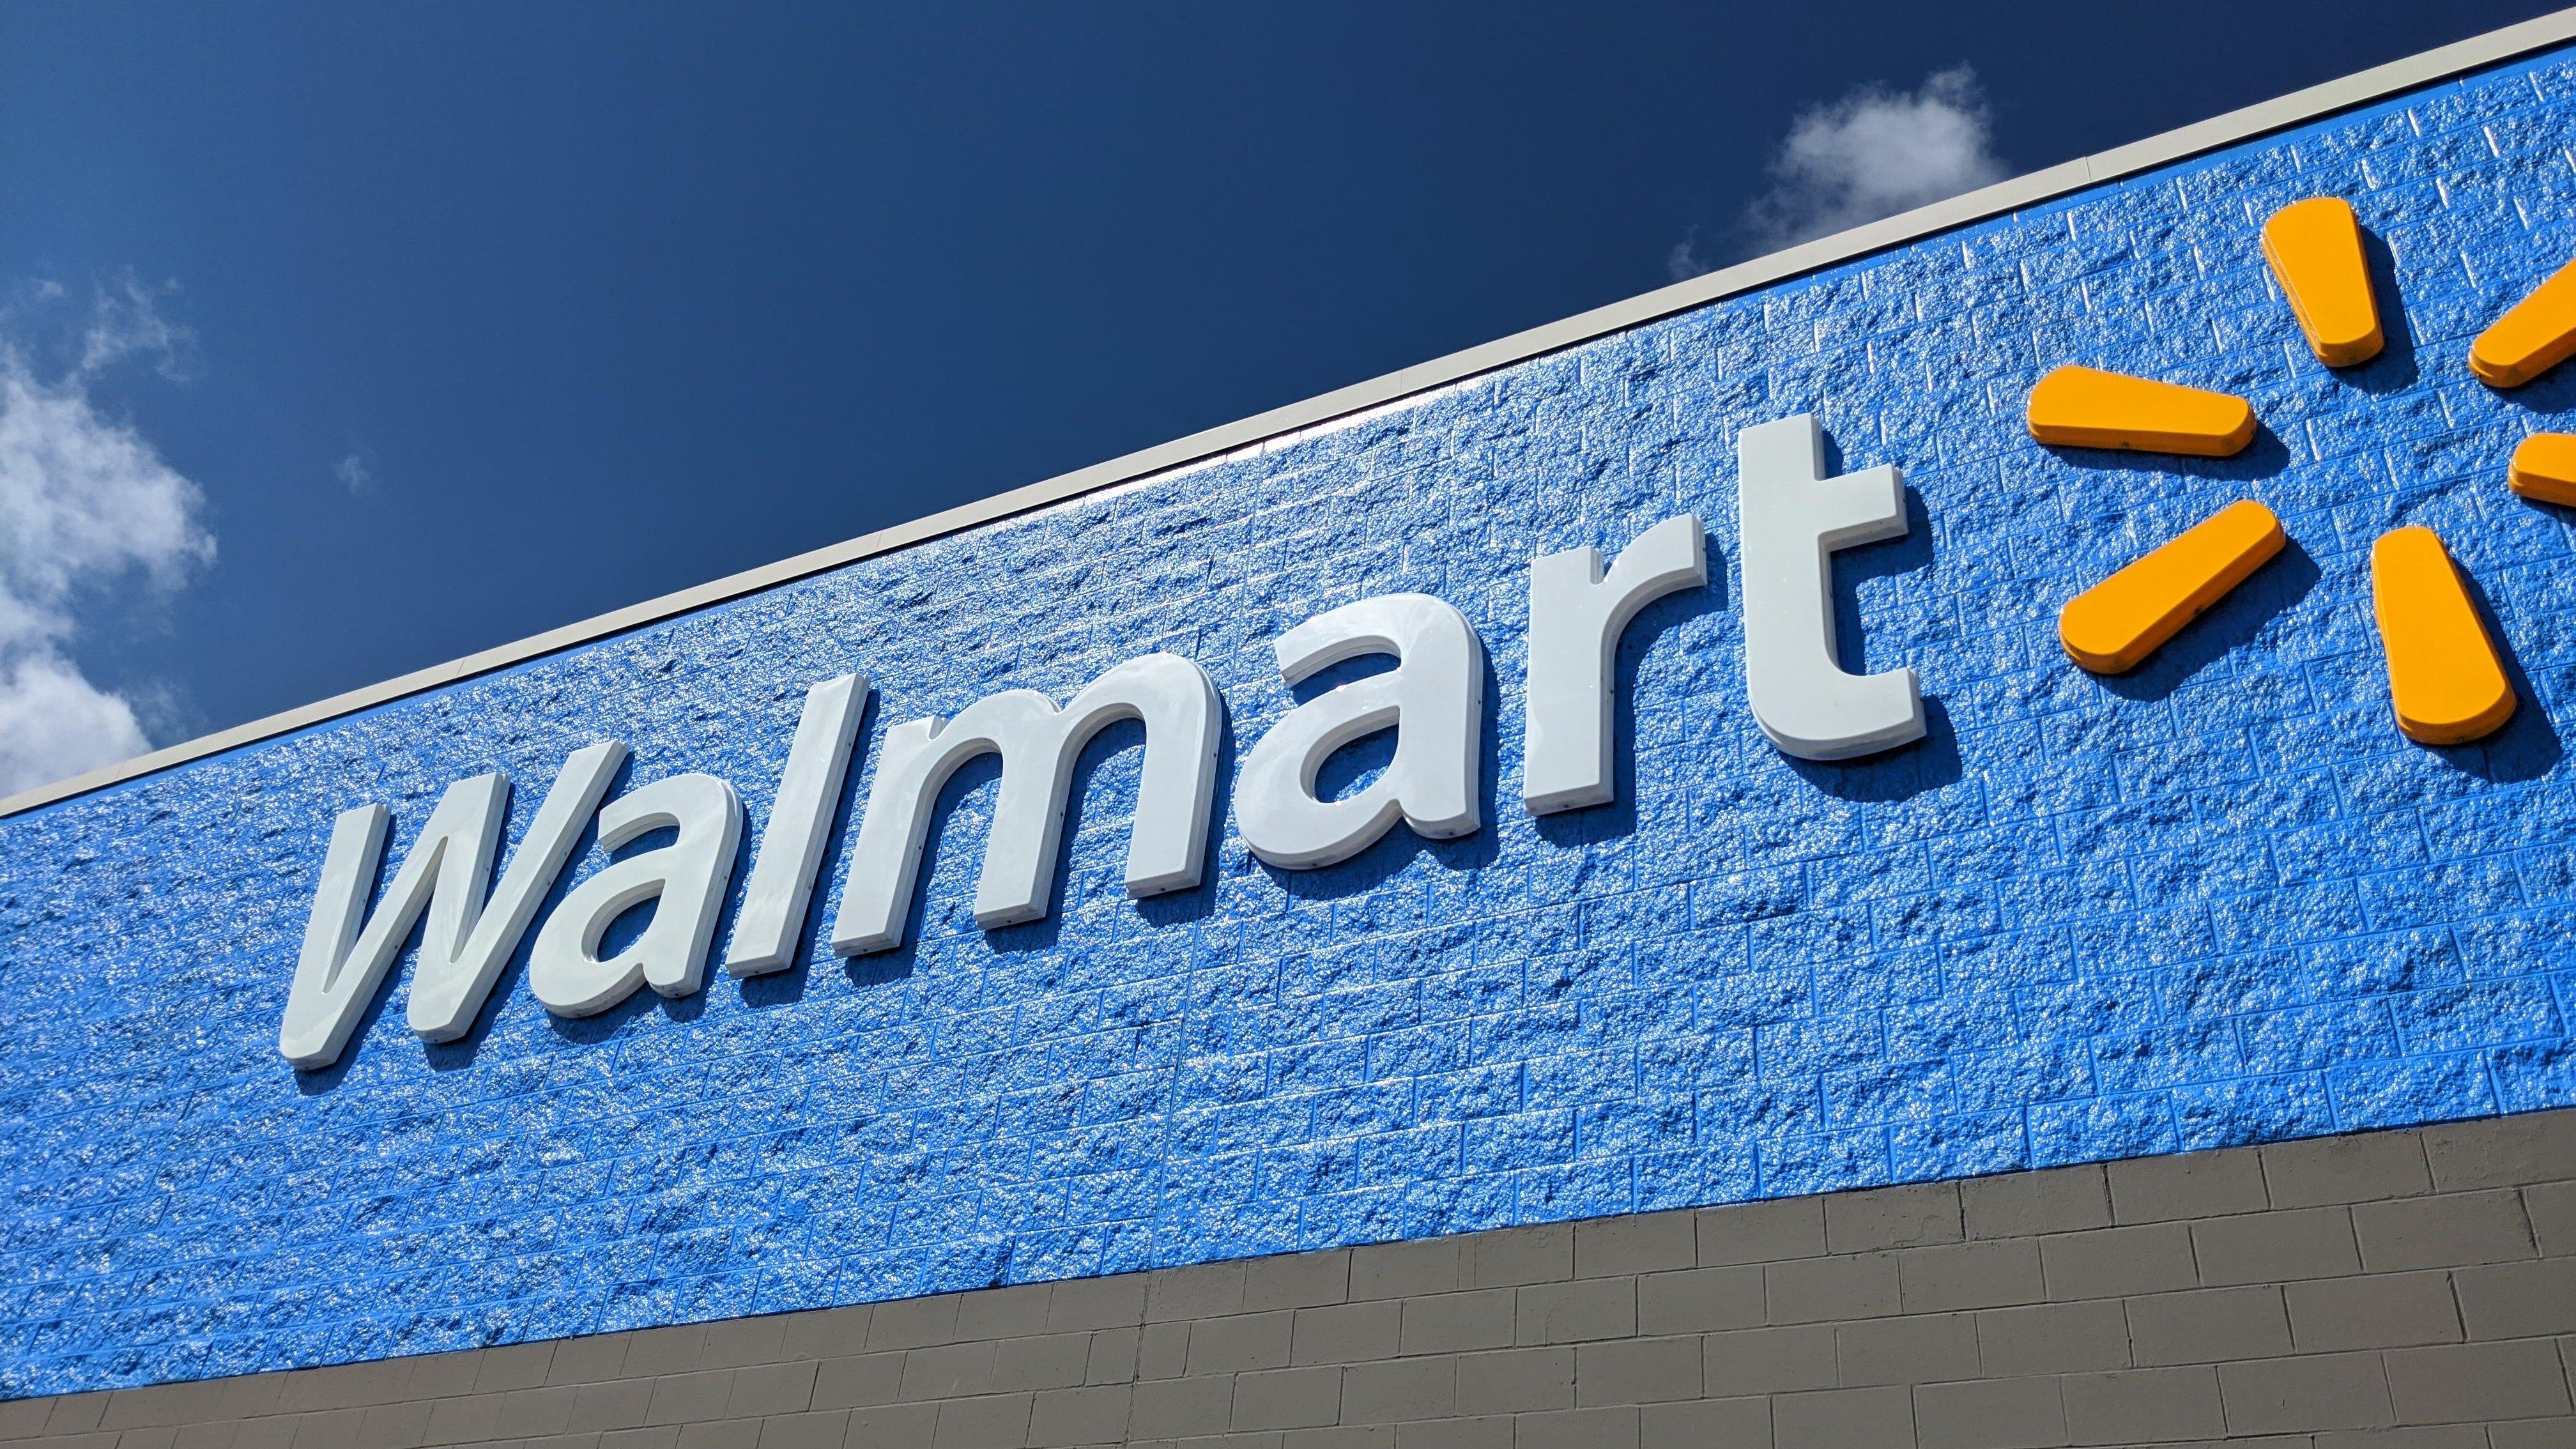 Walmart Ask Sam Employee App This Tool Helps Workers Help Shoppers